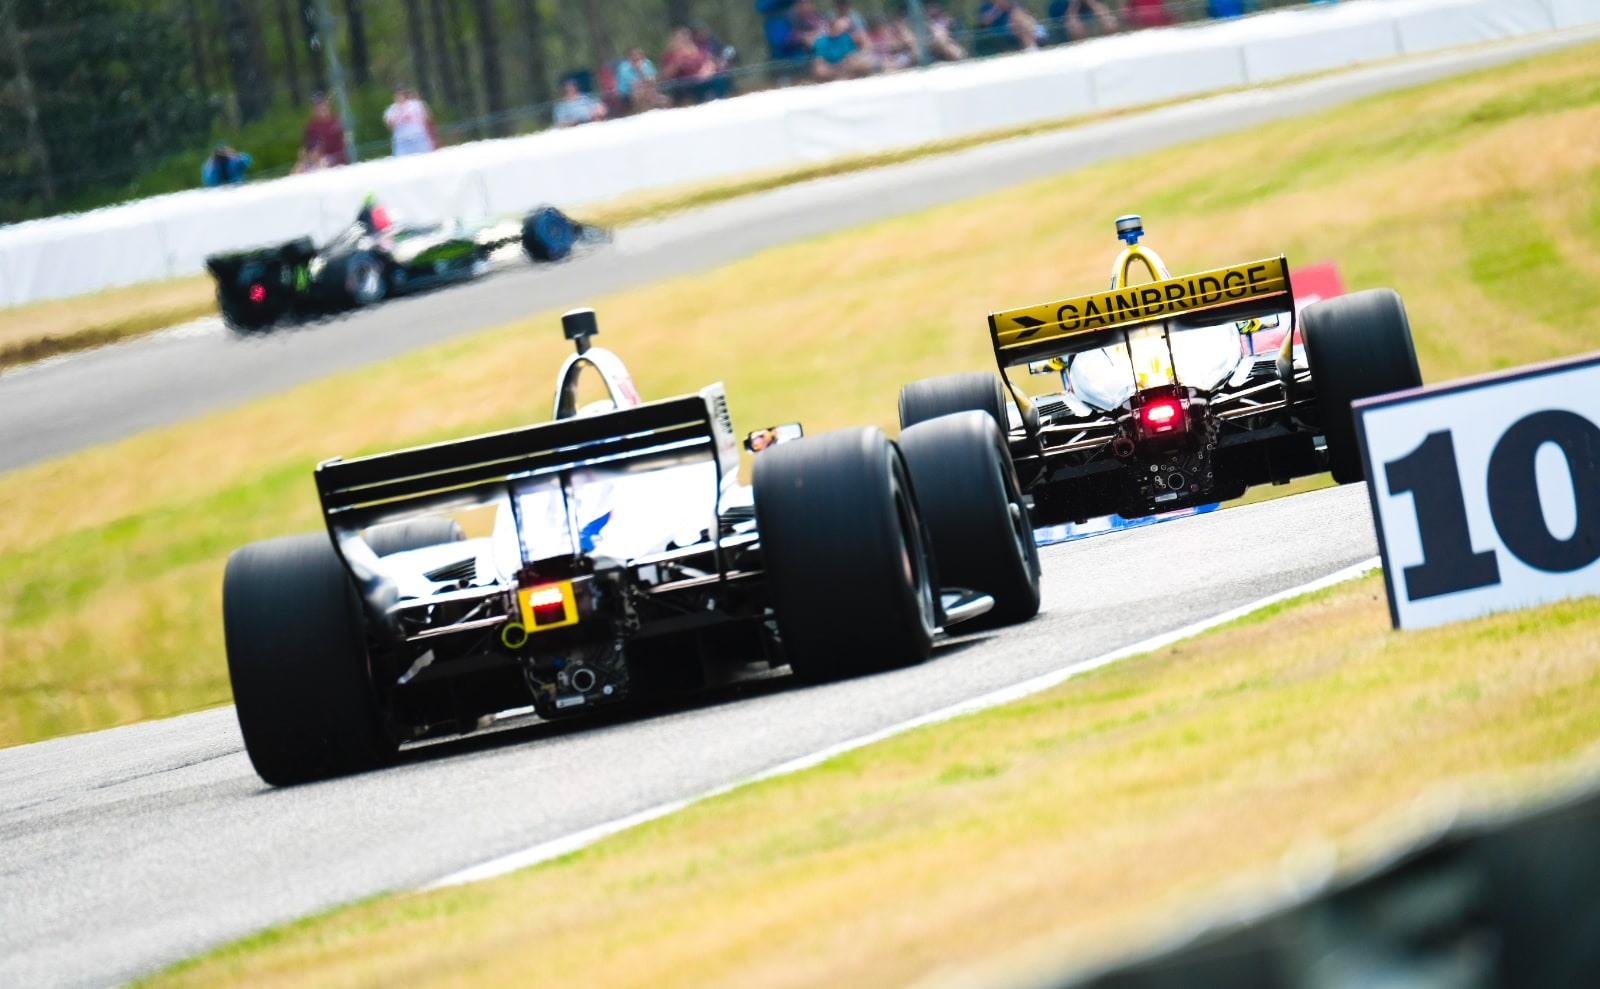 Zach Veach navigates Barber IndyCar track in 2019 race